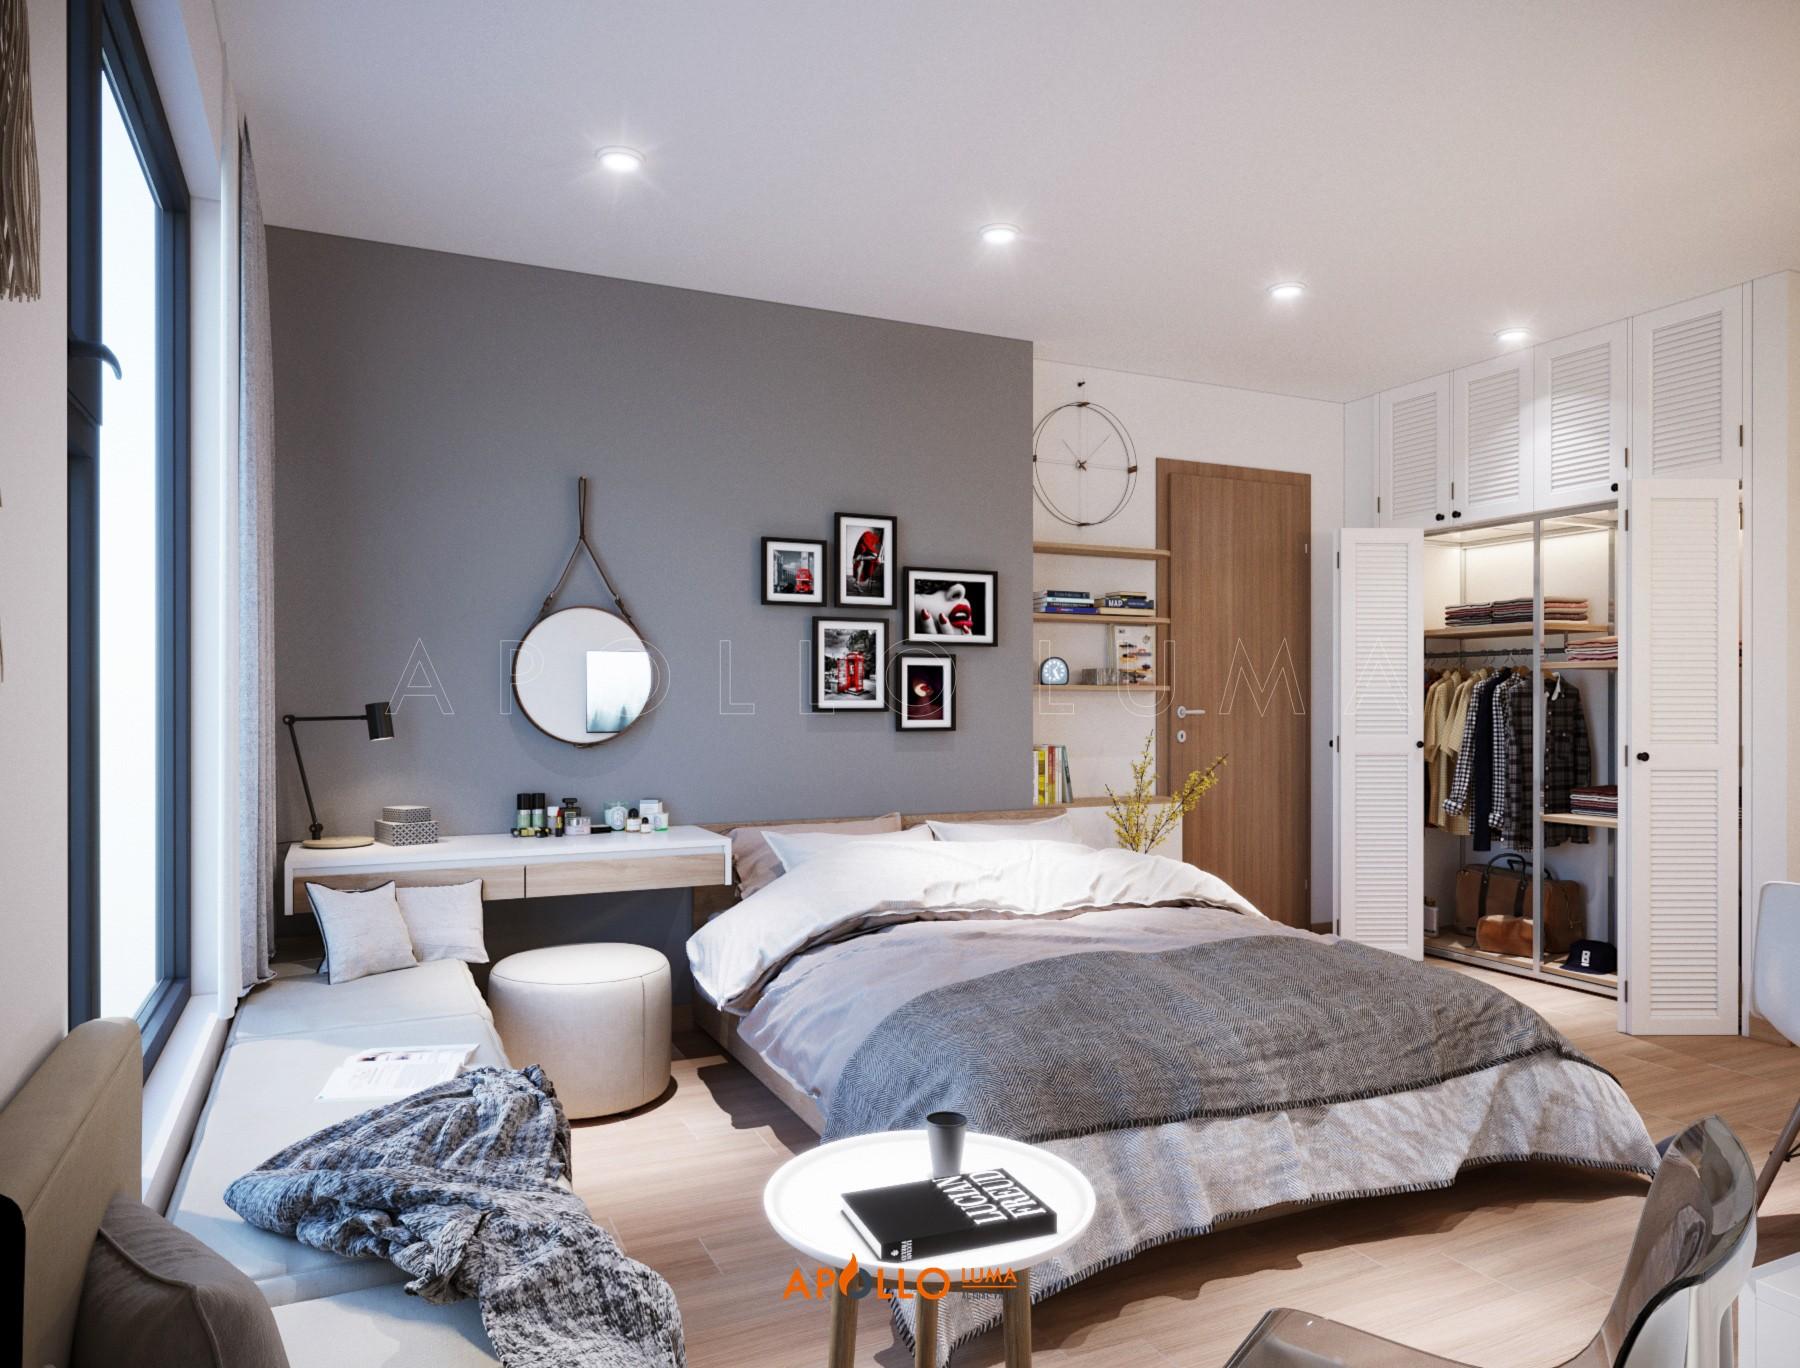 Thiết kế nội thất căn hộ Studio Vinhomes Ocean Park Gia Lâm